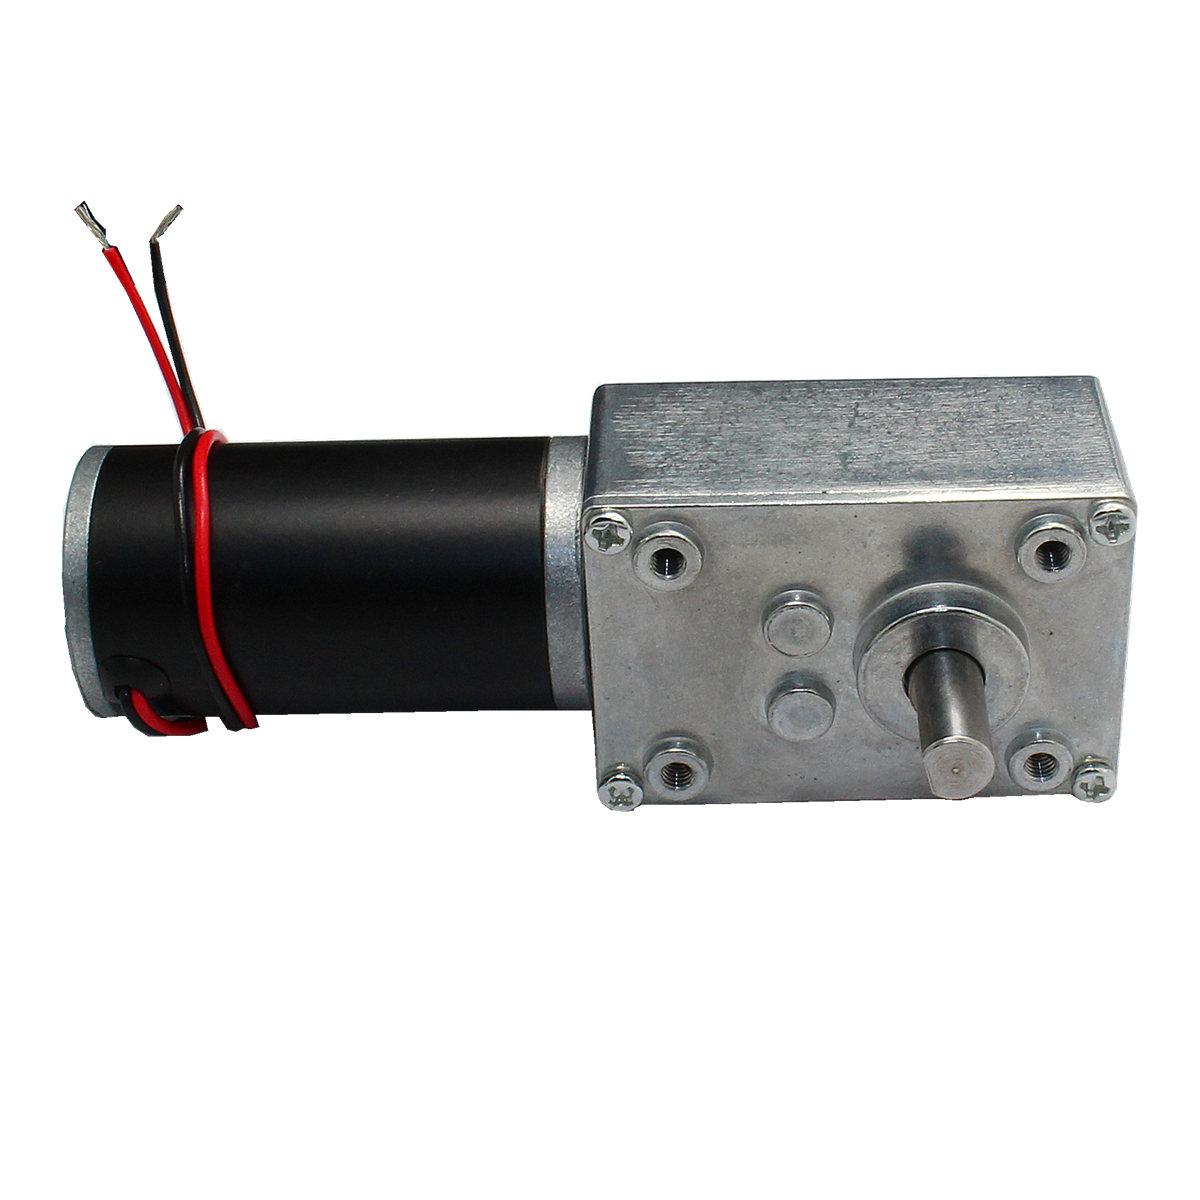 Window Accessories worm gear motor track drive motor GW31ZY 24V 27rpm